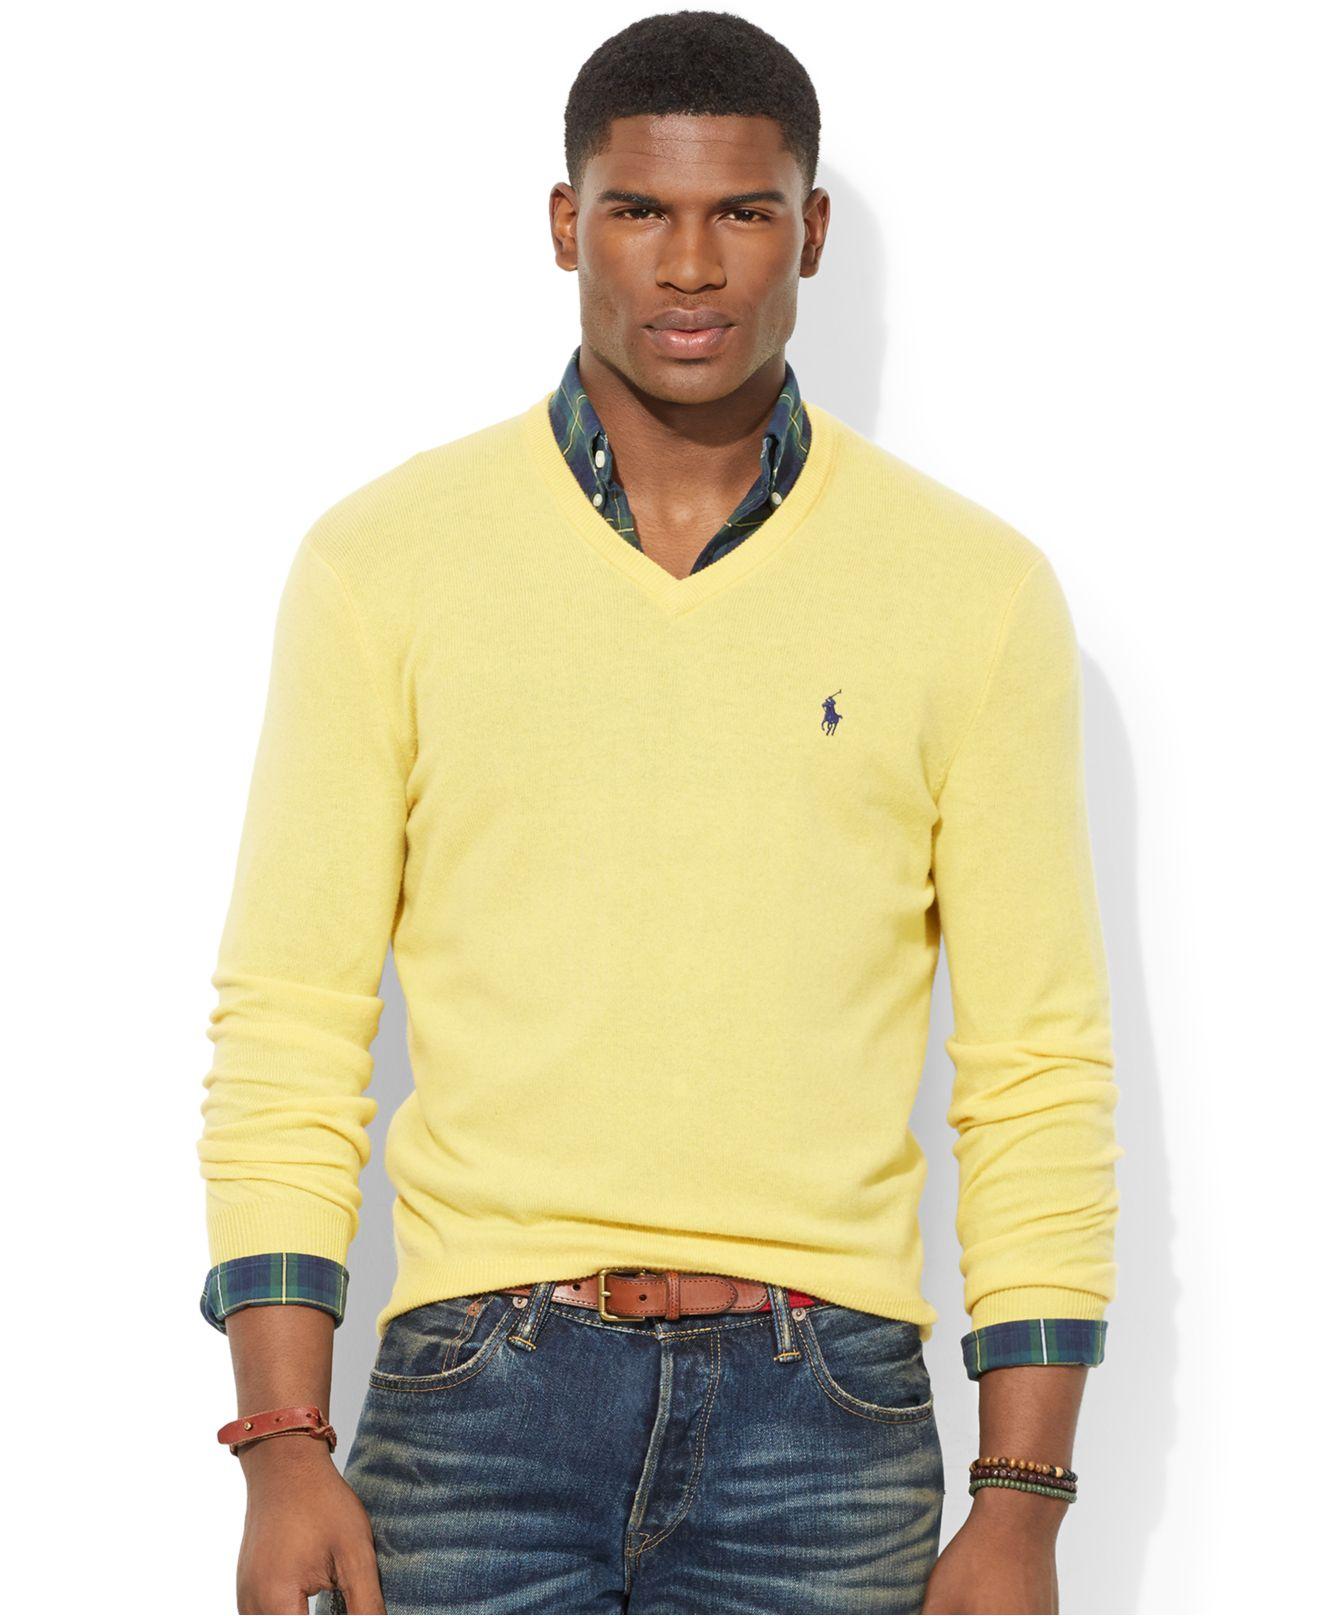 8414a9c08f64 Lyst - Polo Ralph Lauren Loryelle Merino Wool V-Neck Sweater in ...